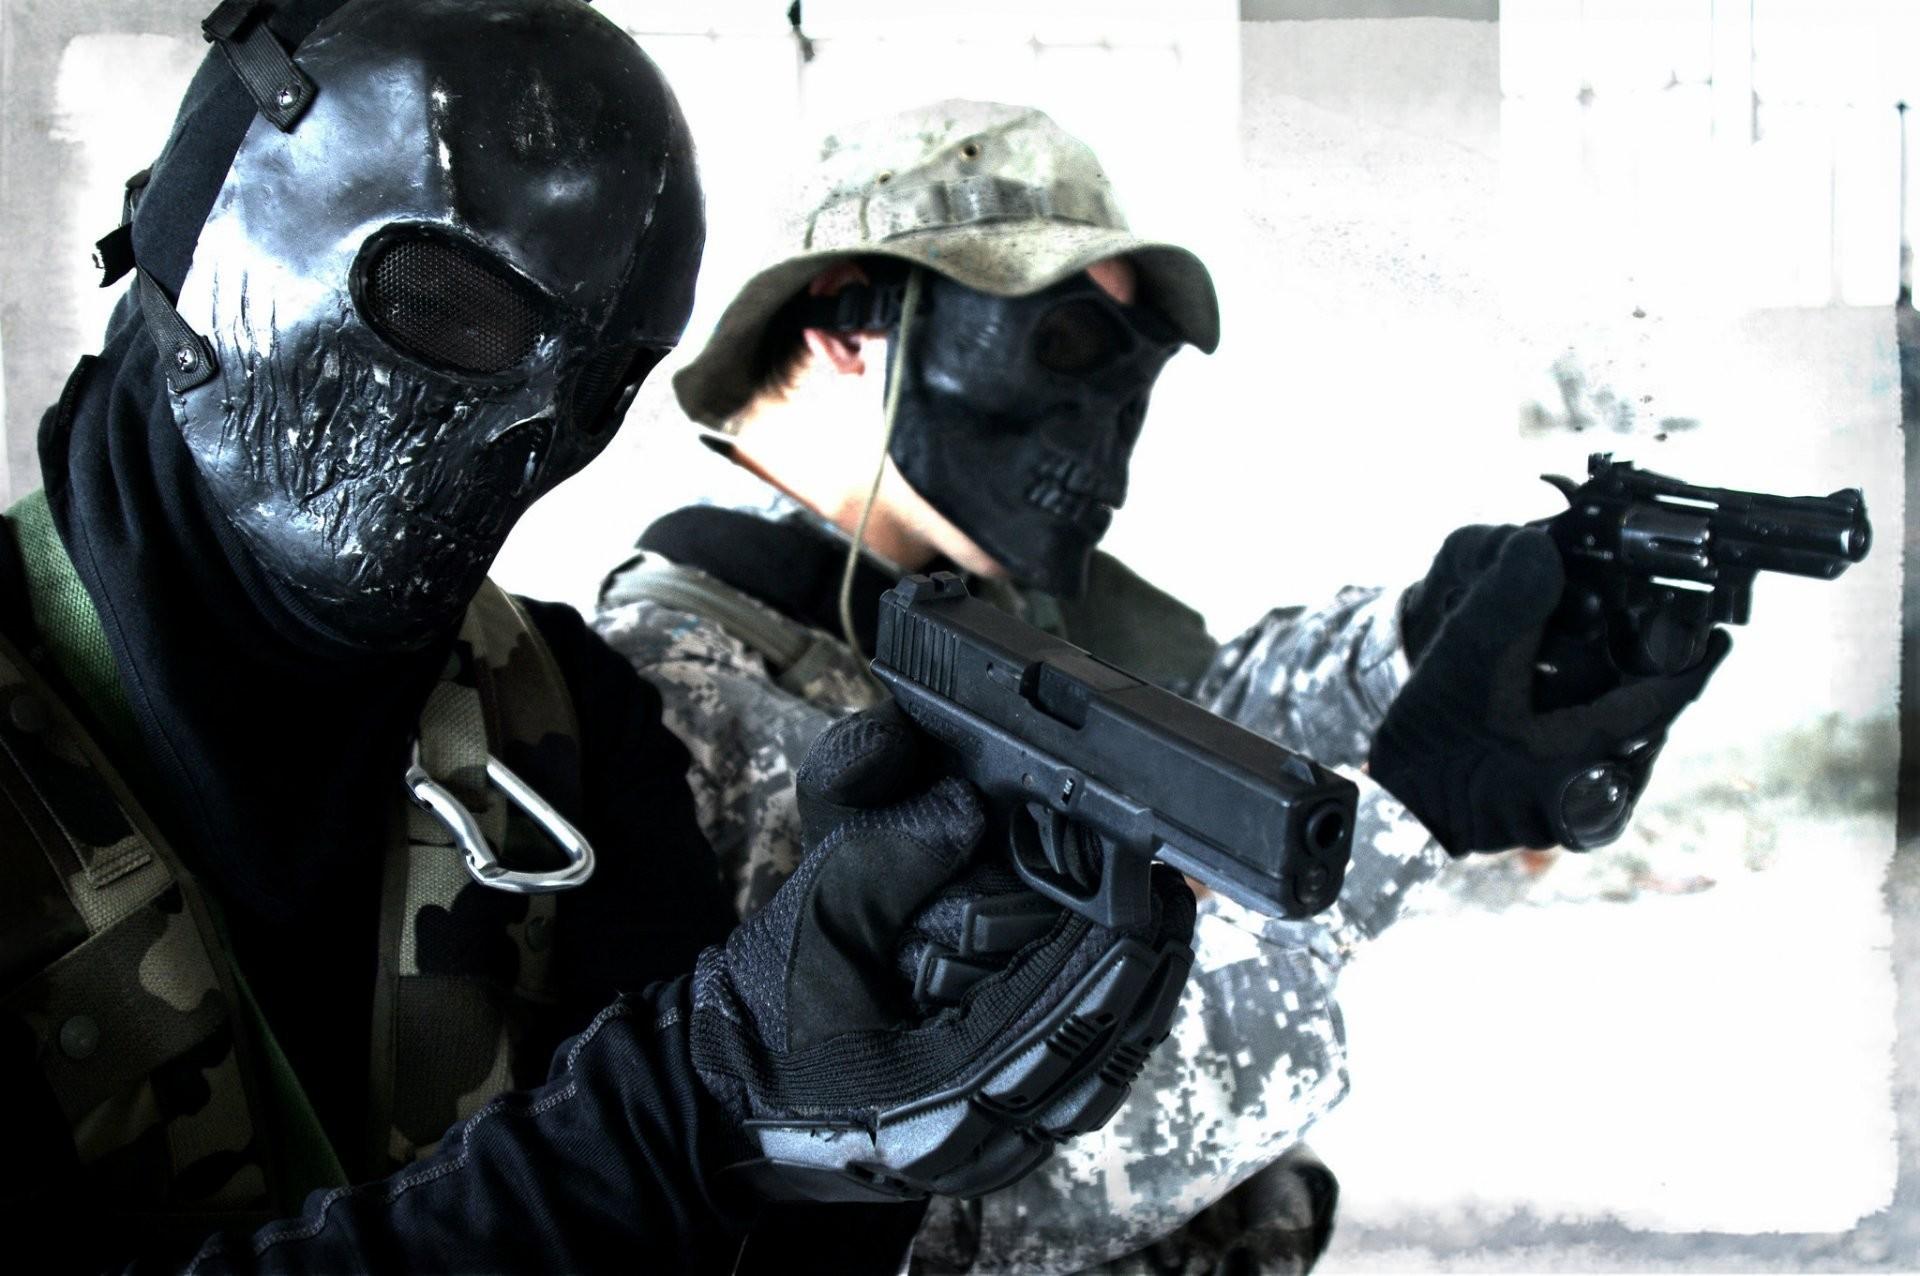 men masks glock revolver guns weapon